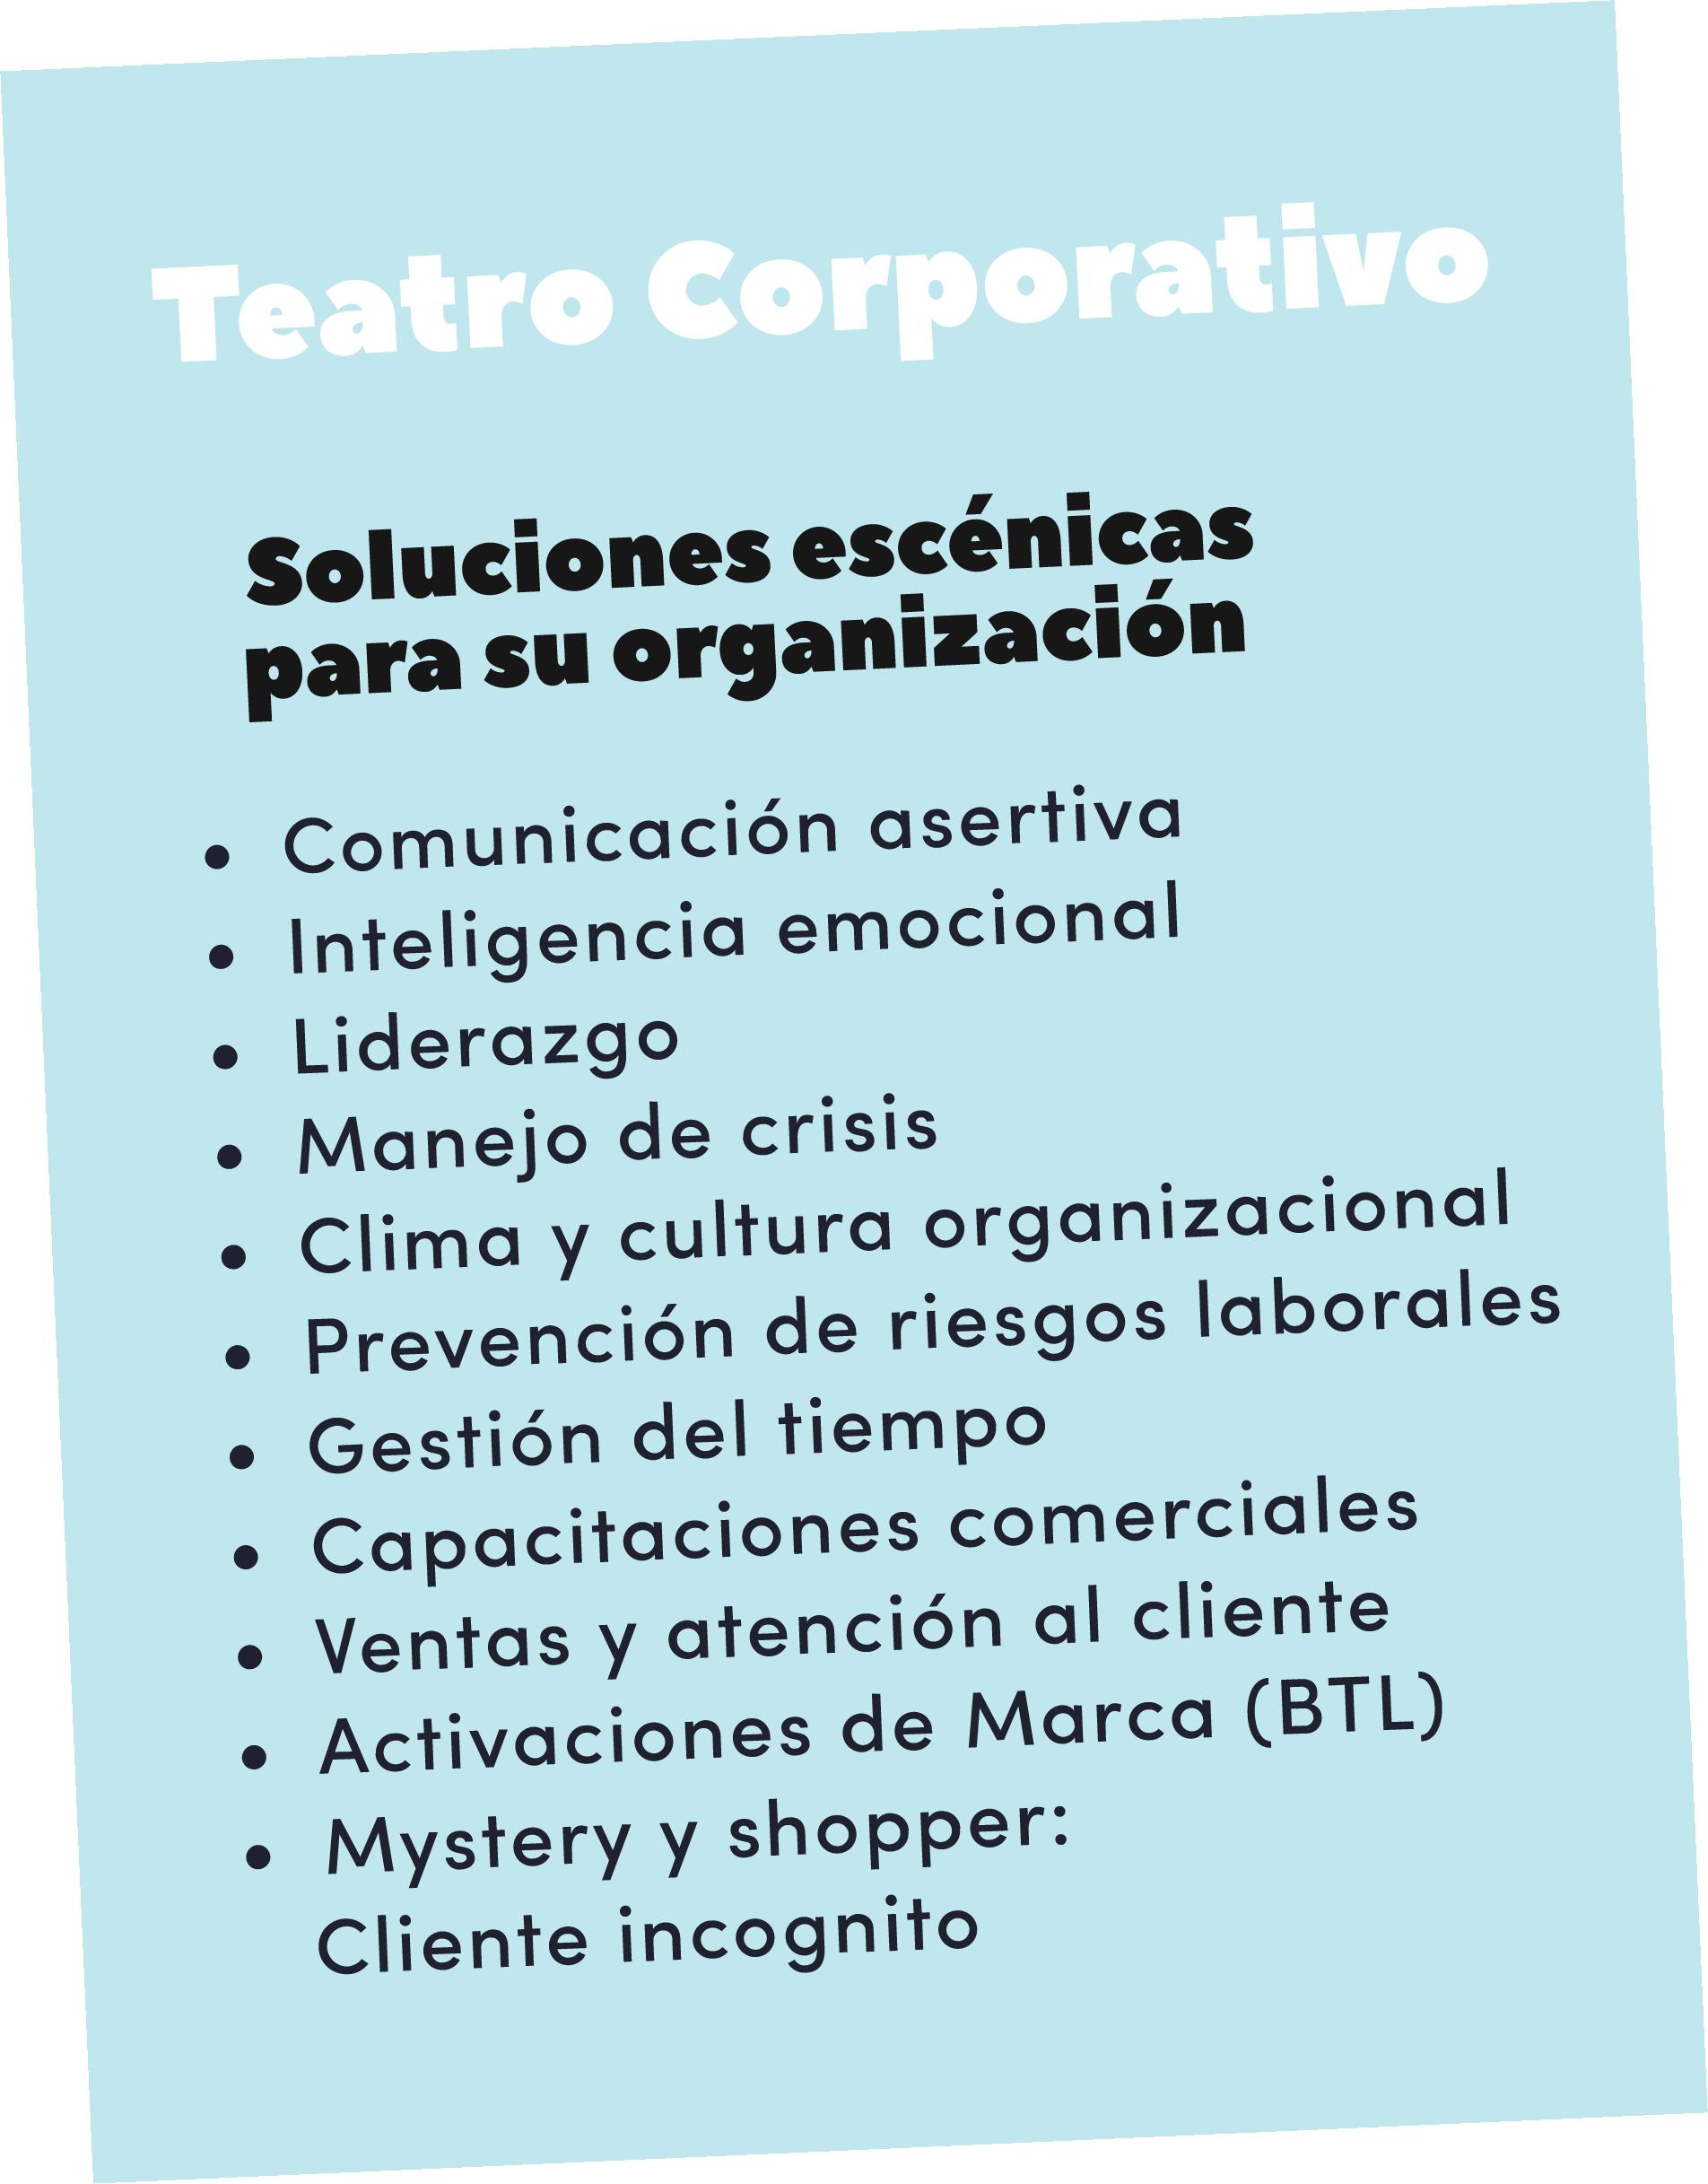 teatrocorporativoweb